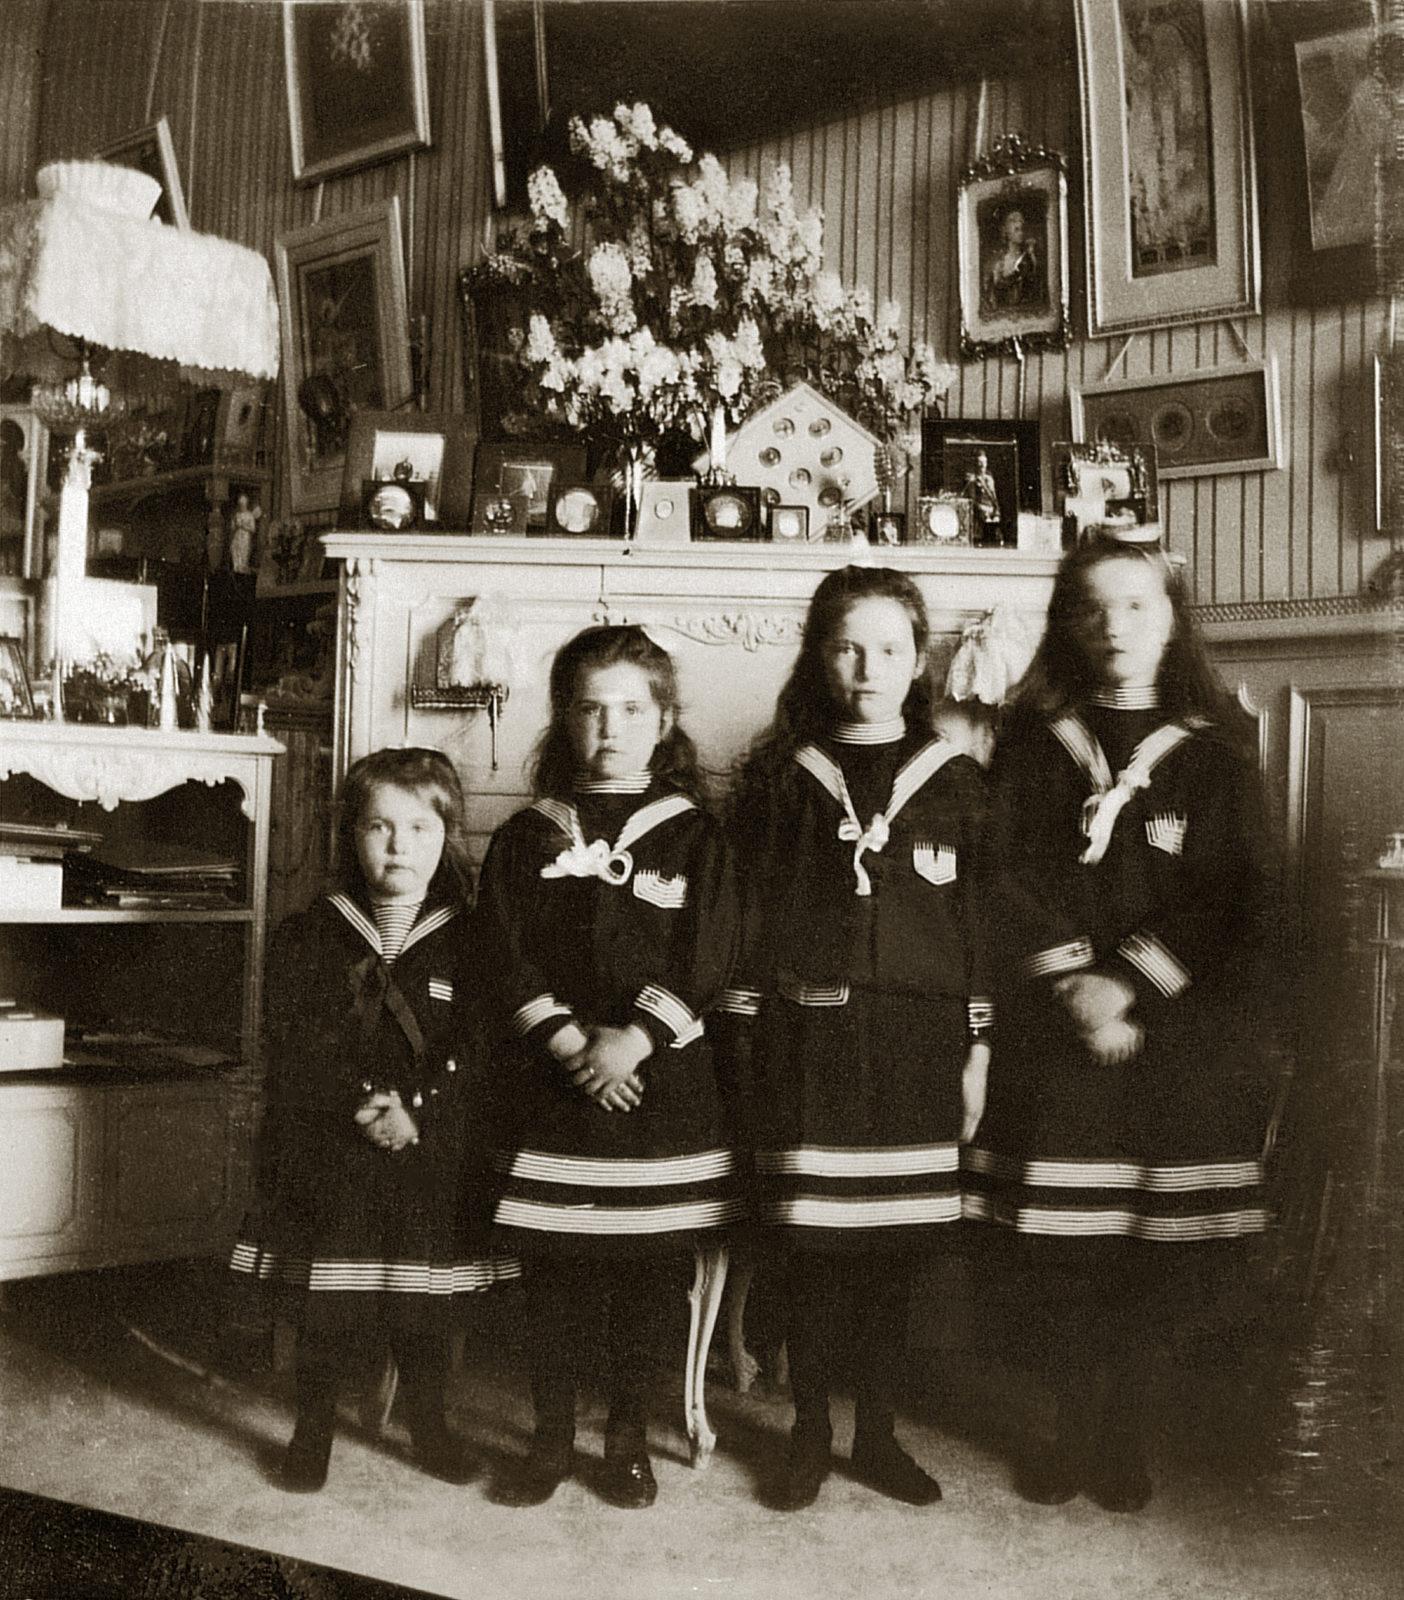 The Grand Duchesses Olga, Tatiana, Maria and Anastasia. Daughters of Emperor Nicholas II and Empress Alexandra Feodorovna. Photo of 1906.